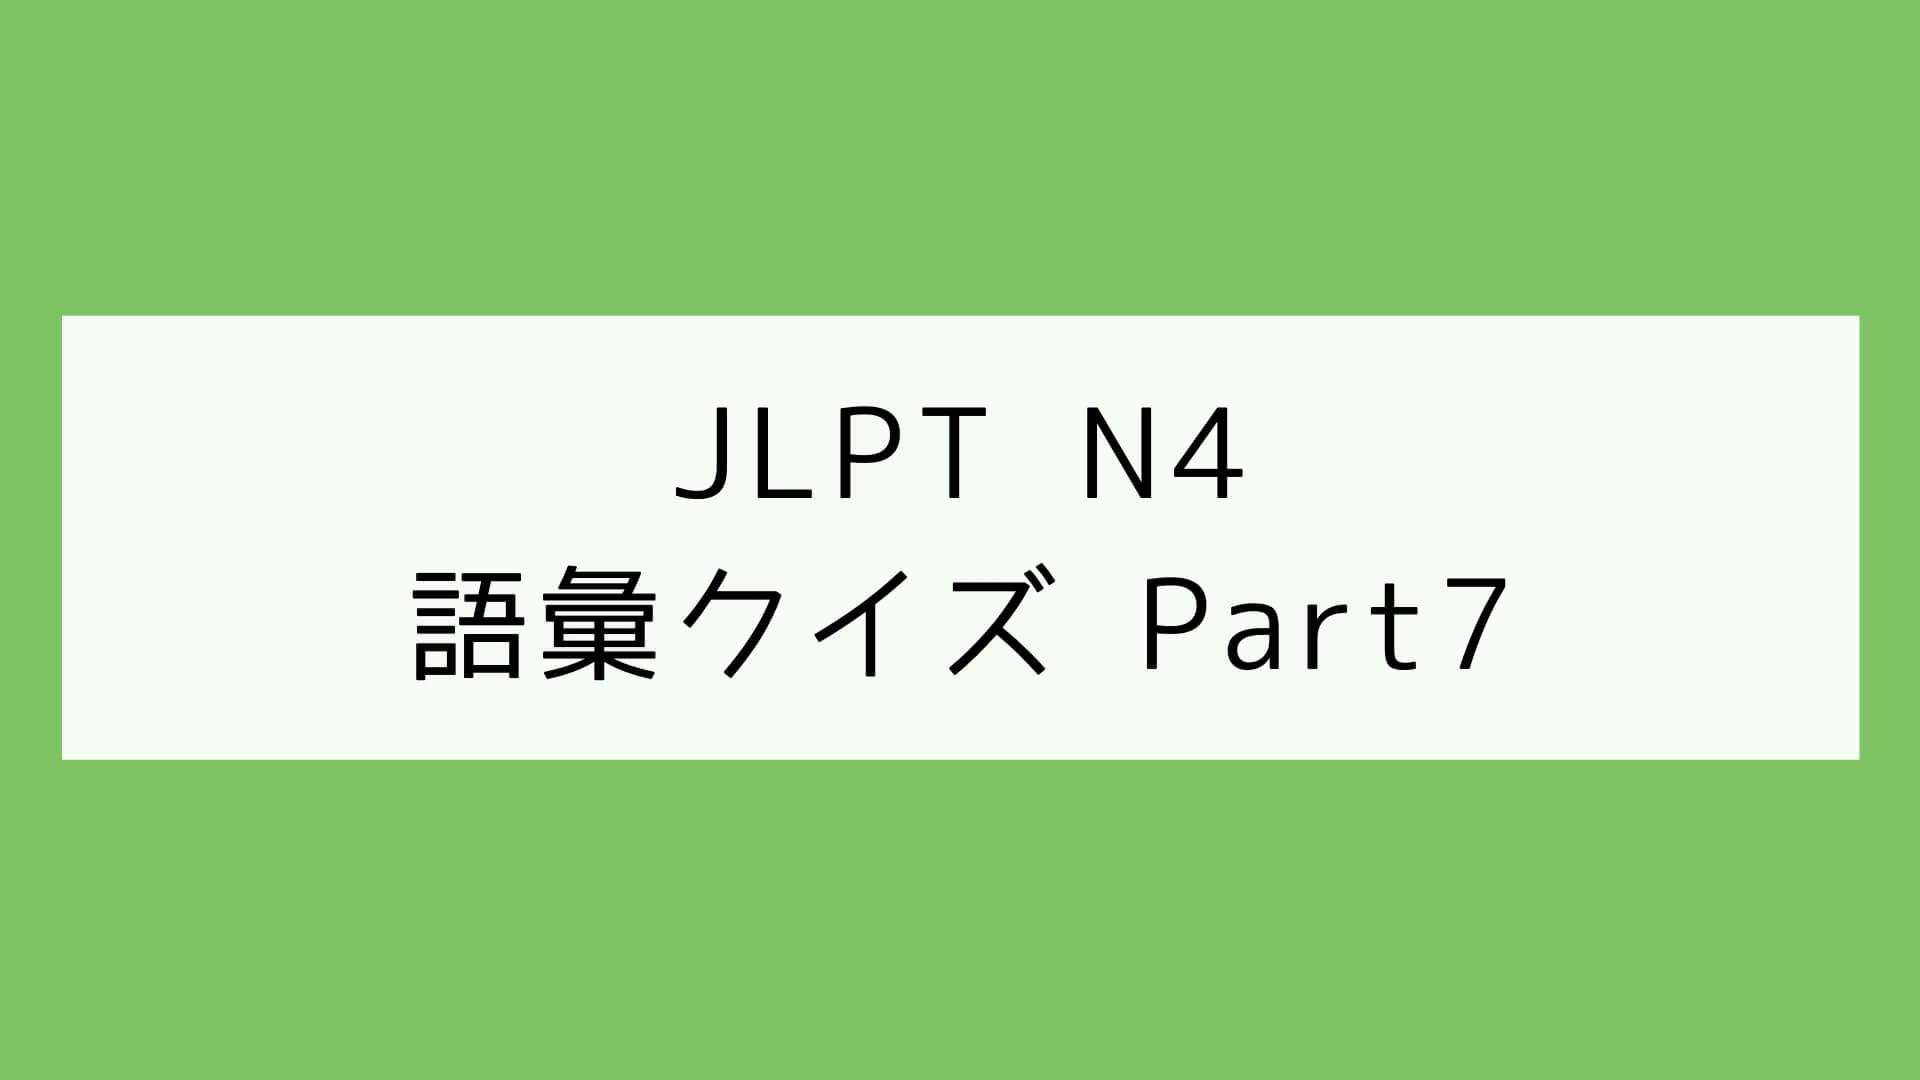 【JLPT N4】語彙クイズ Part7